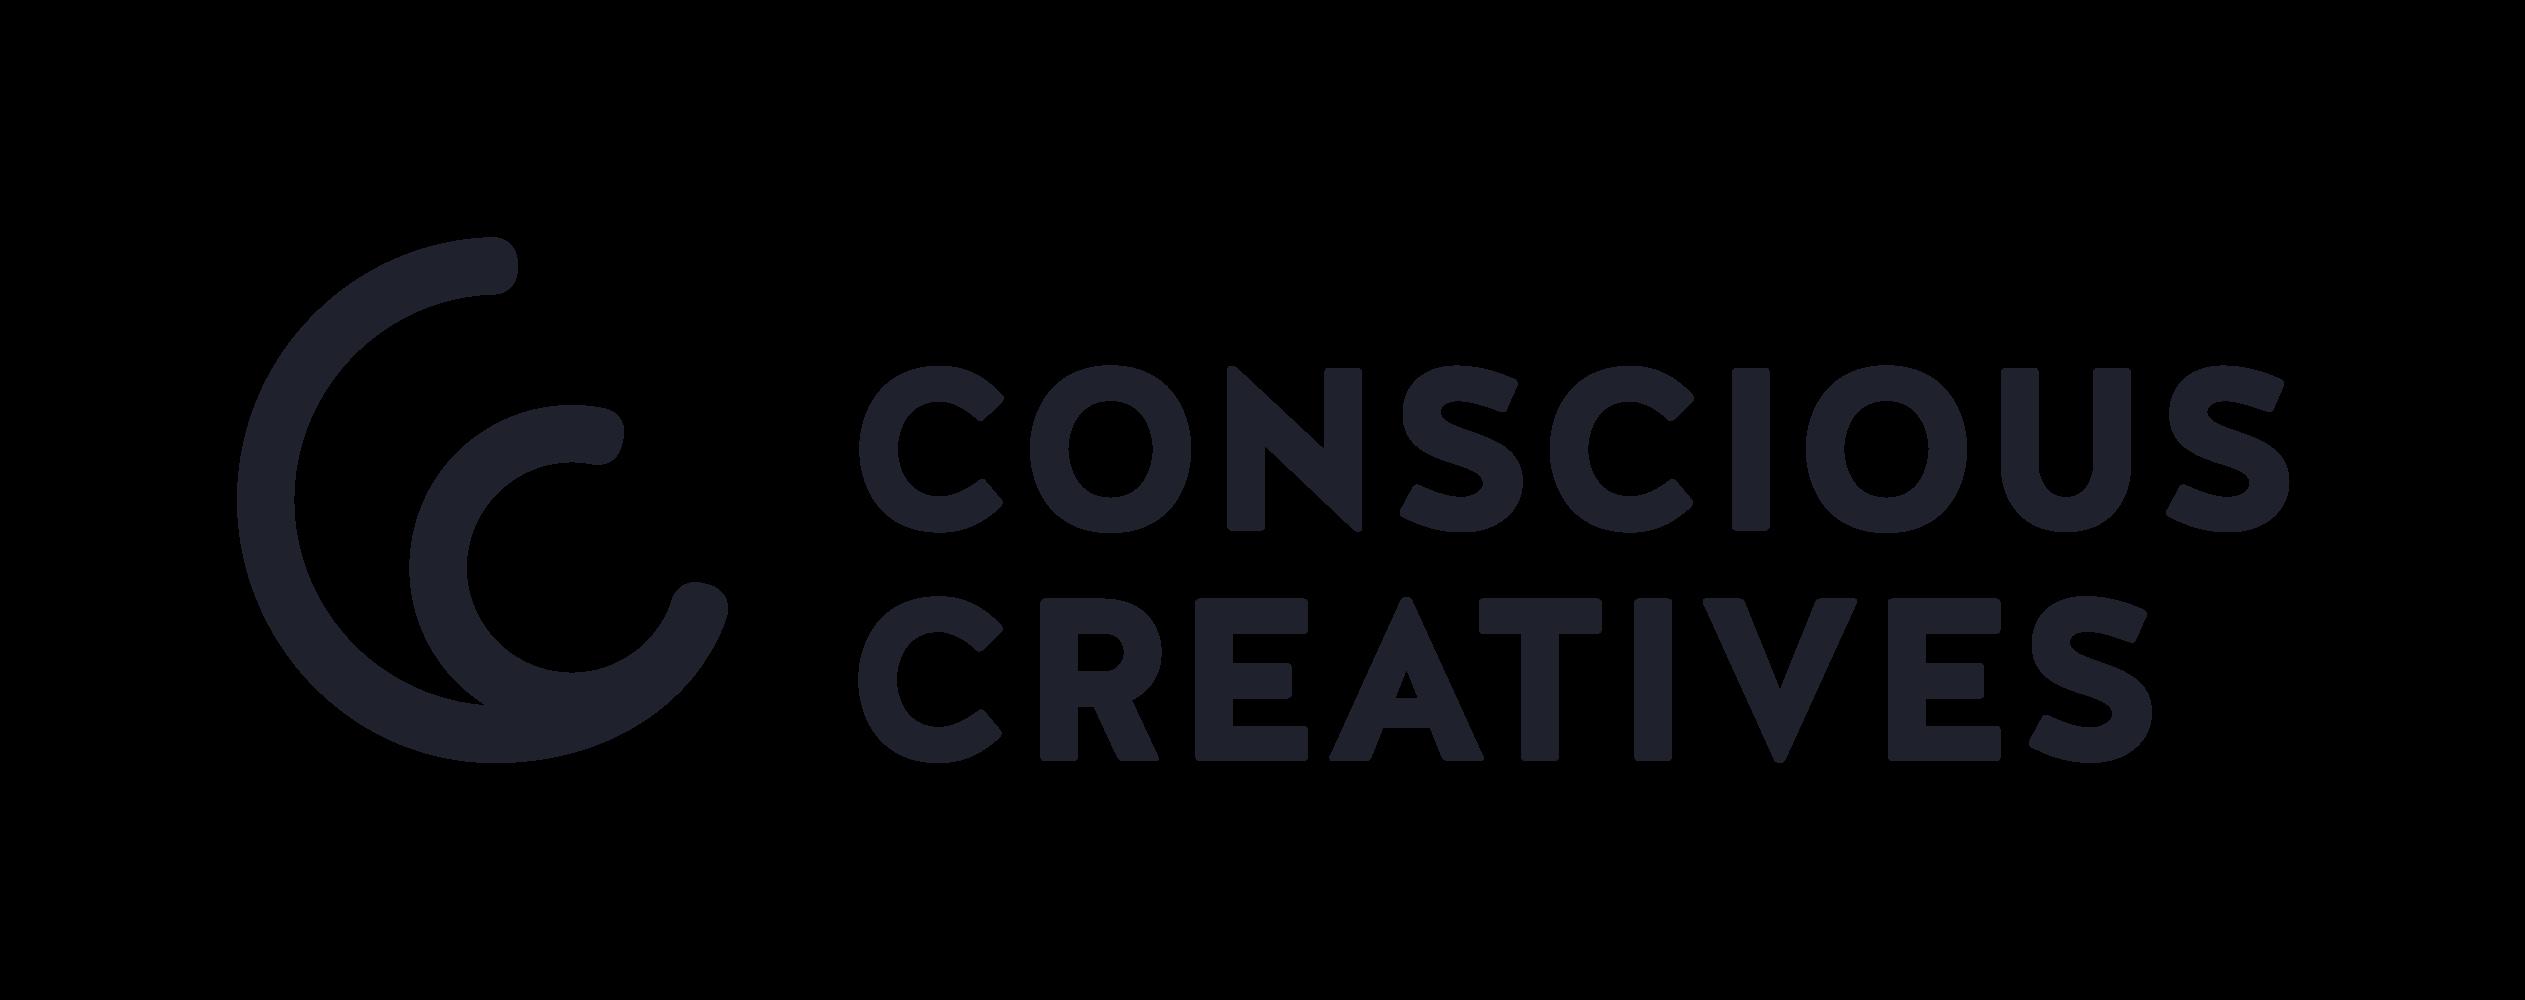 CC-LogoType-Navy-Transparent (002)